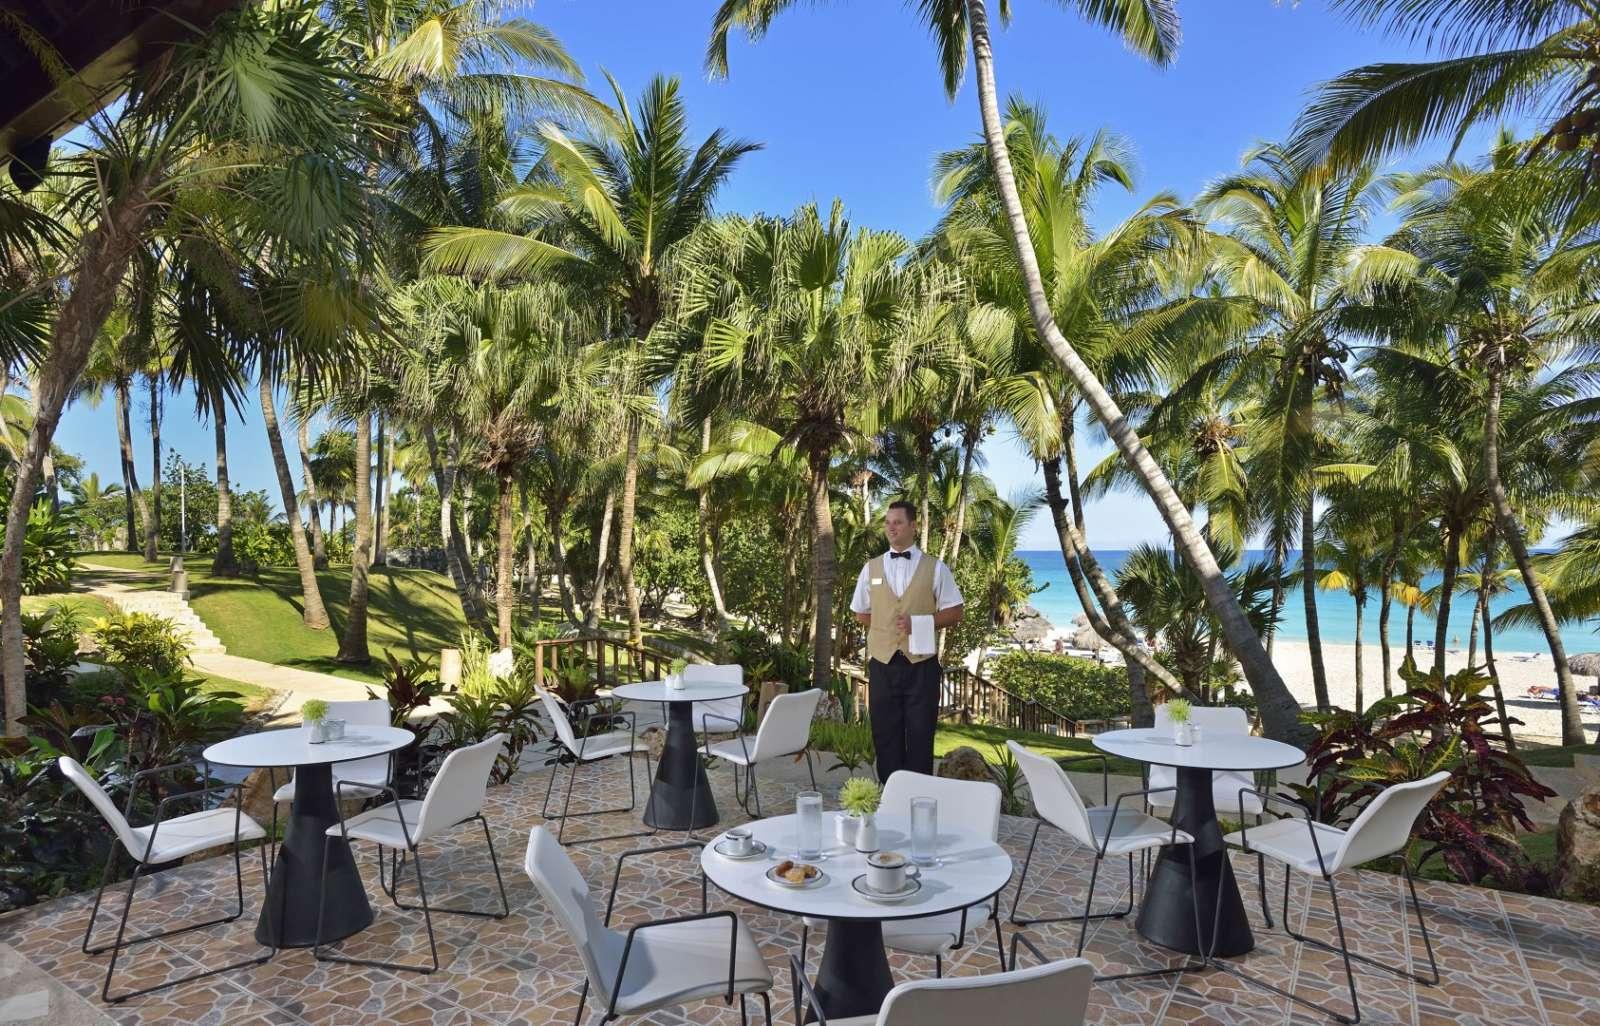 Waiter at Melia Las Americas beach view restaurant